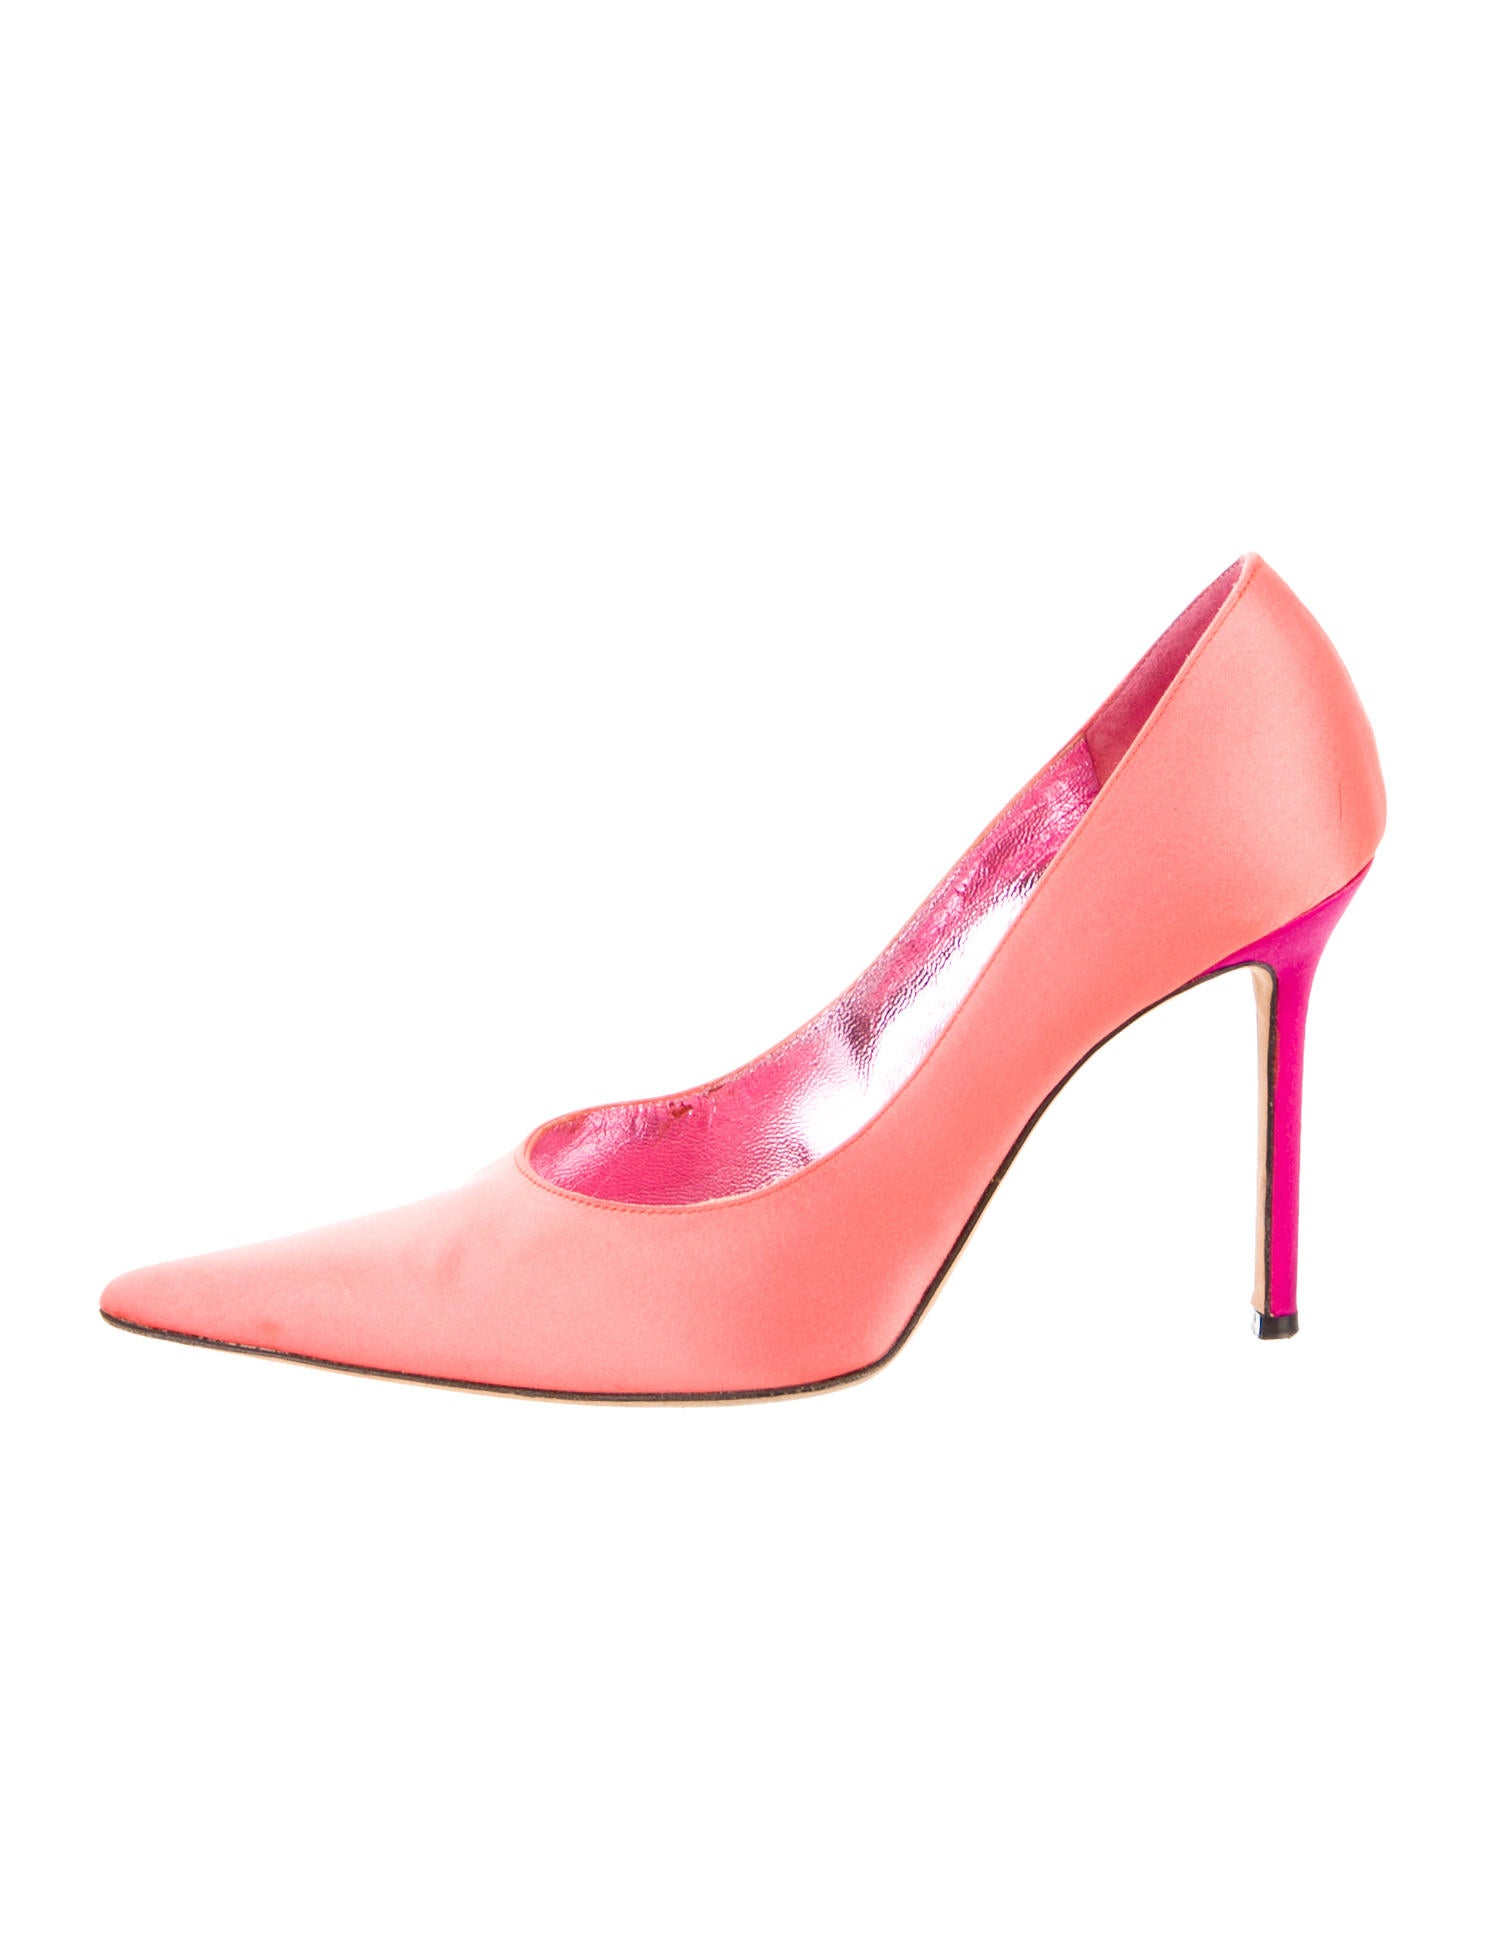 Christian Lacroix Satin Pointed Toe Pumps Shoes